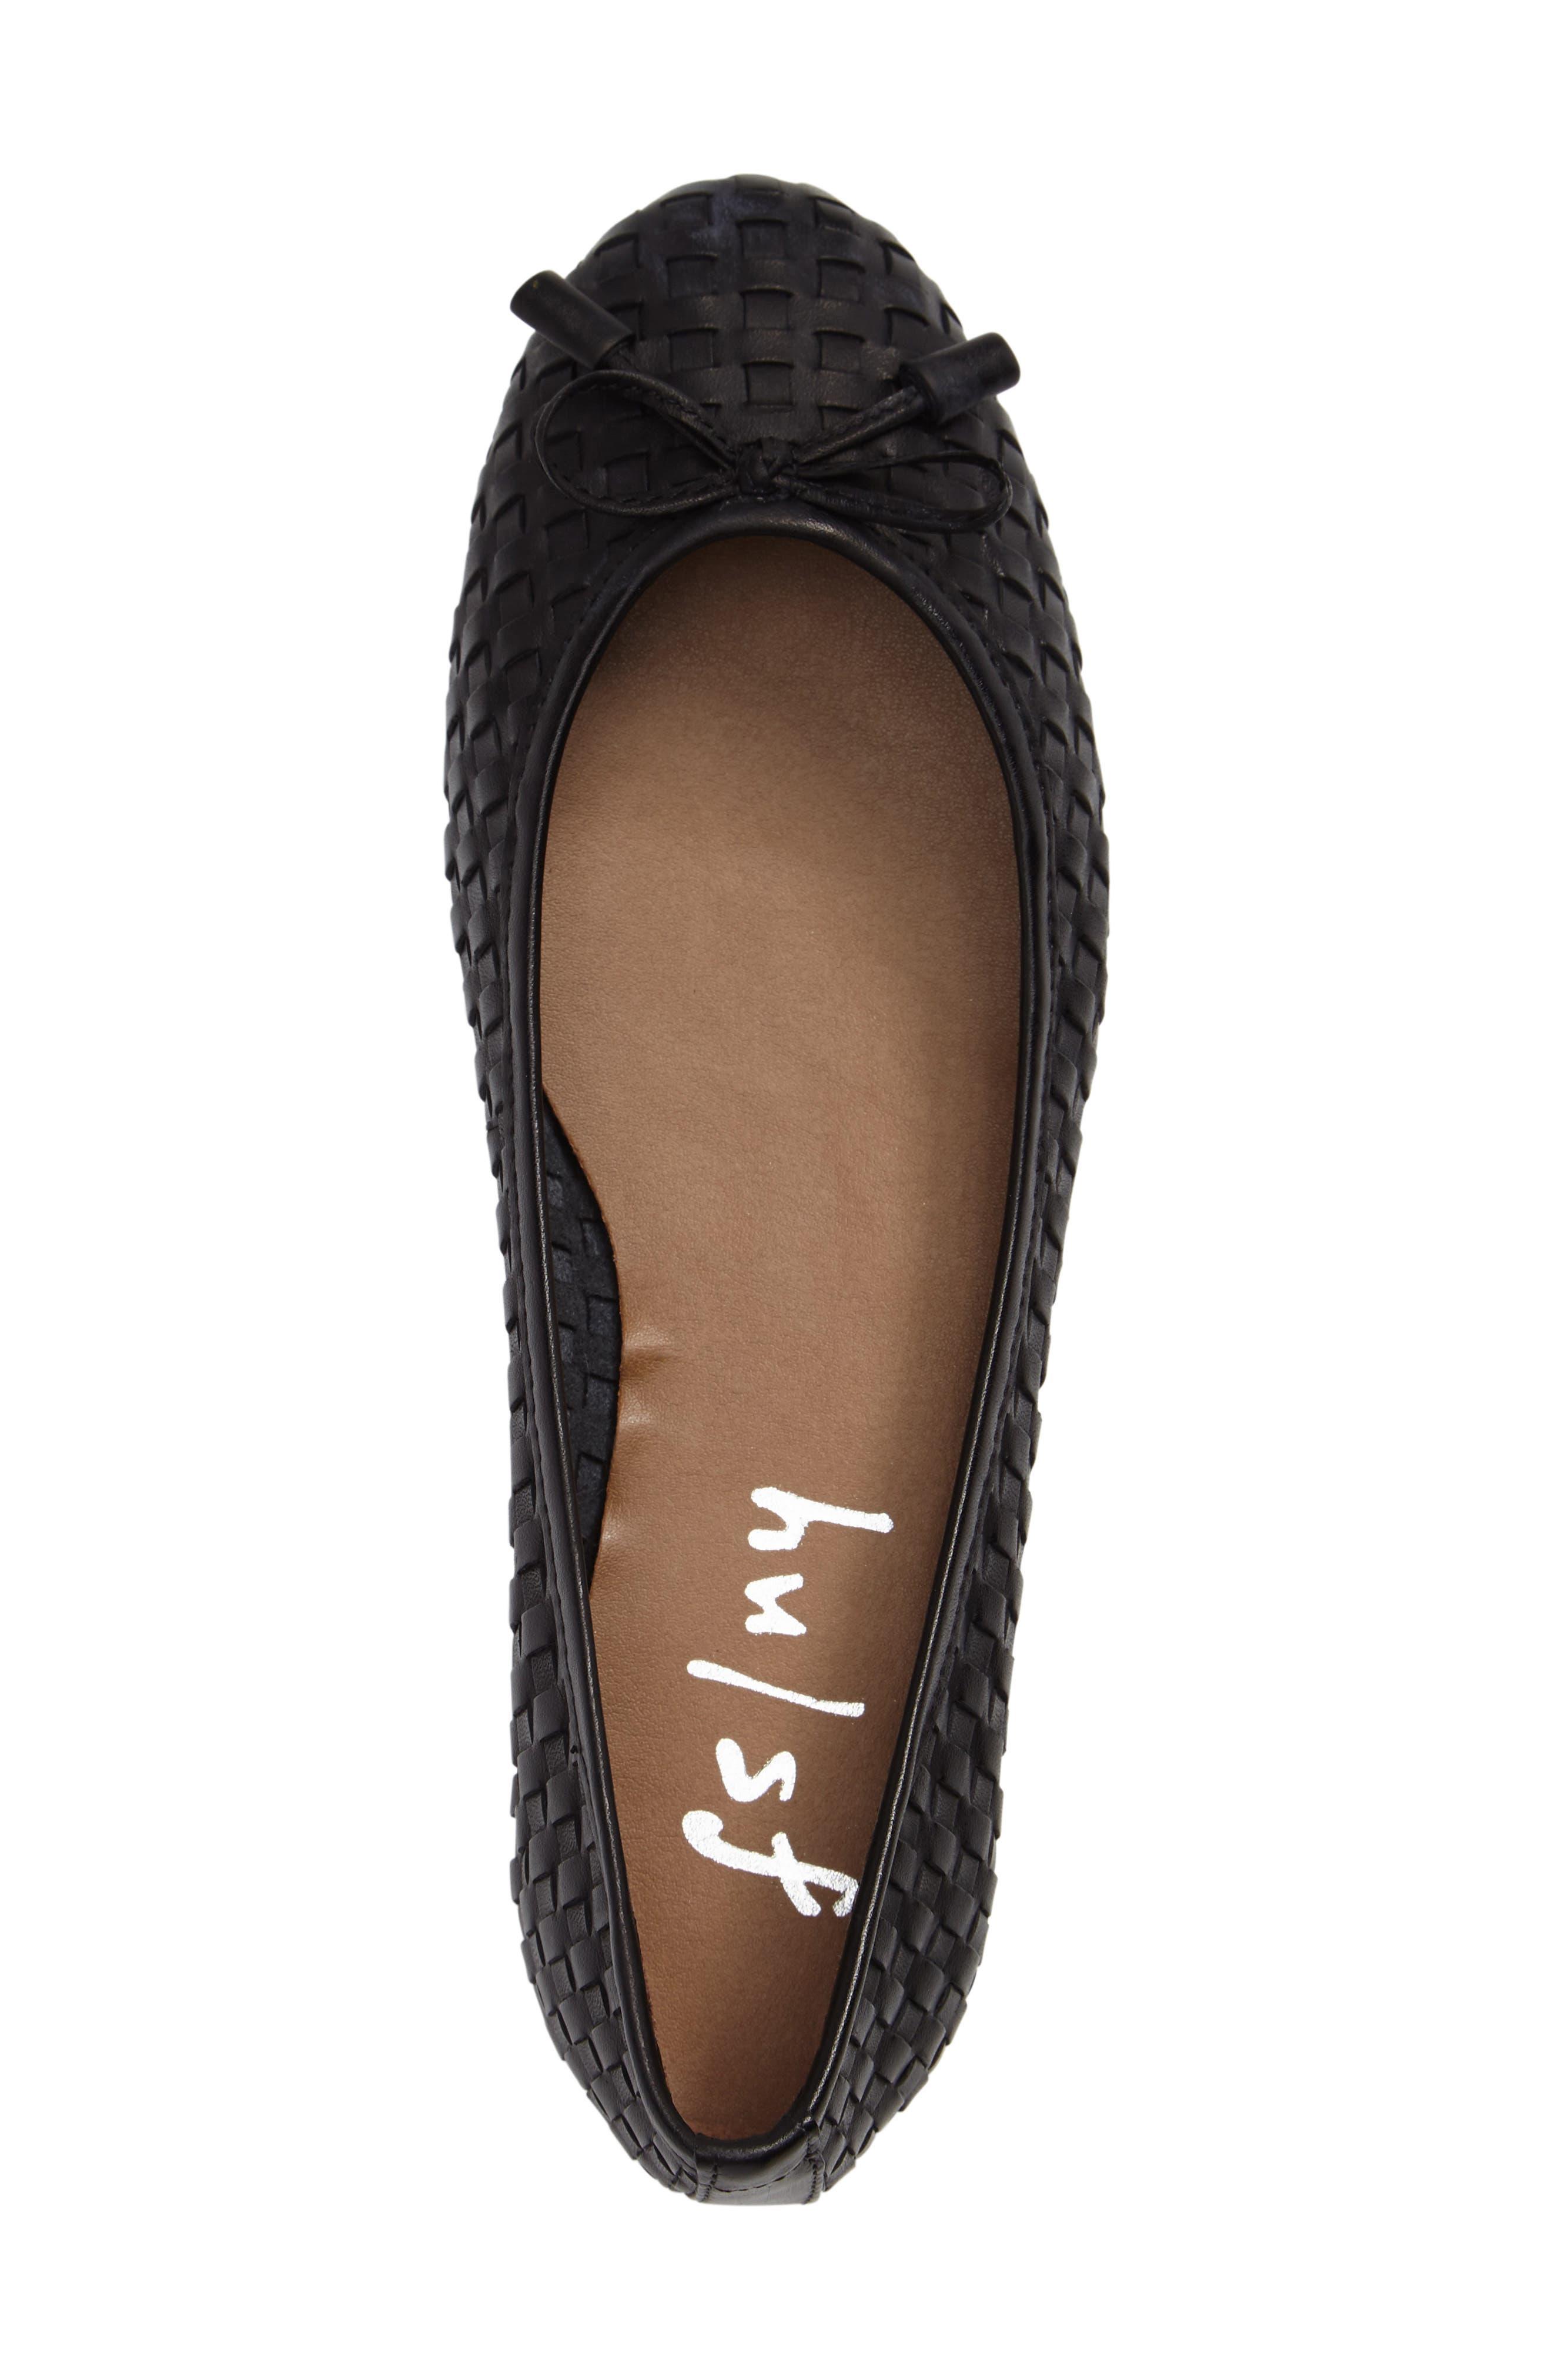 FRENCH SOLE,                             Vogue Ballet Flat,                             Alternate thumbnail 3, color,                             001